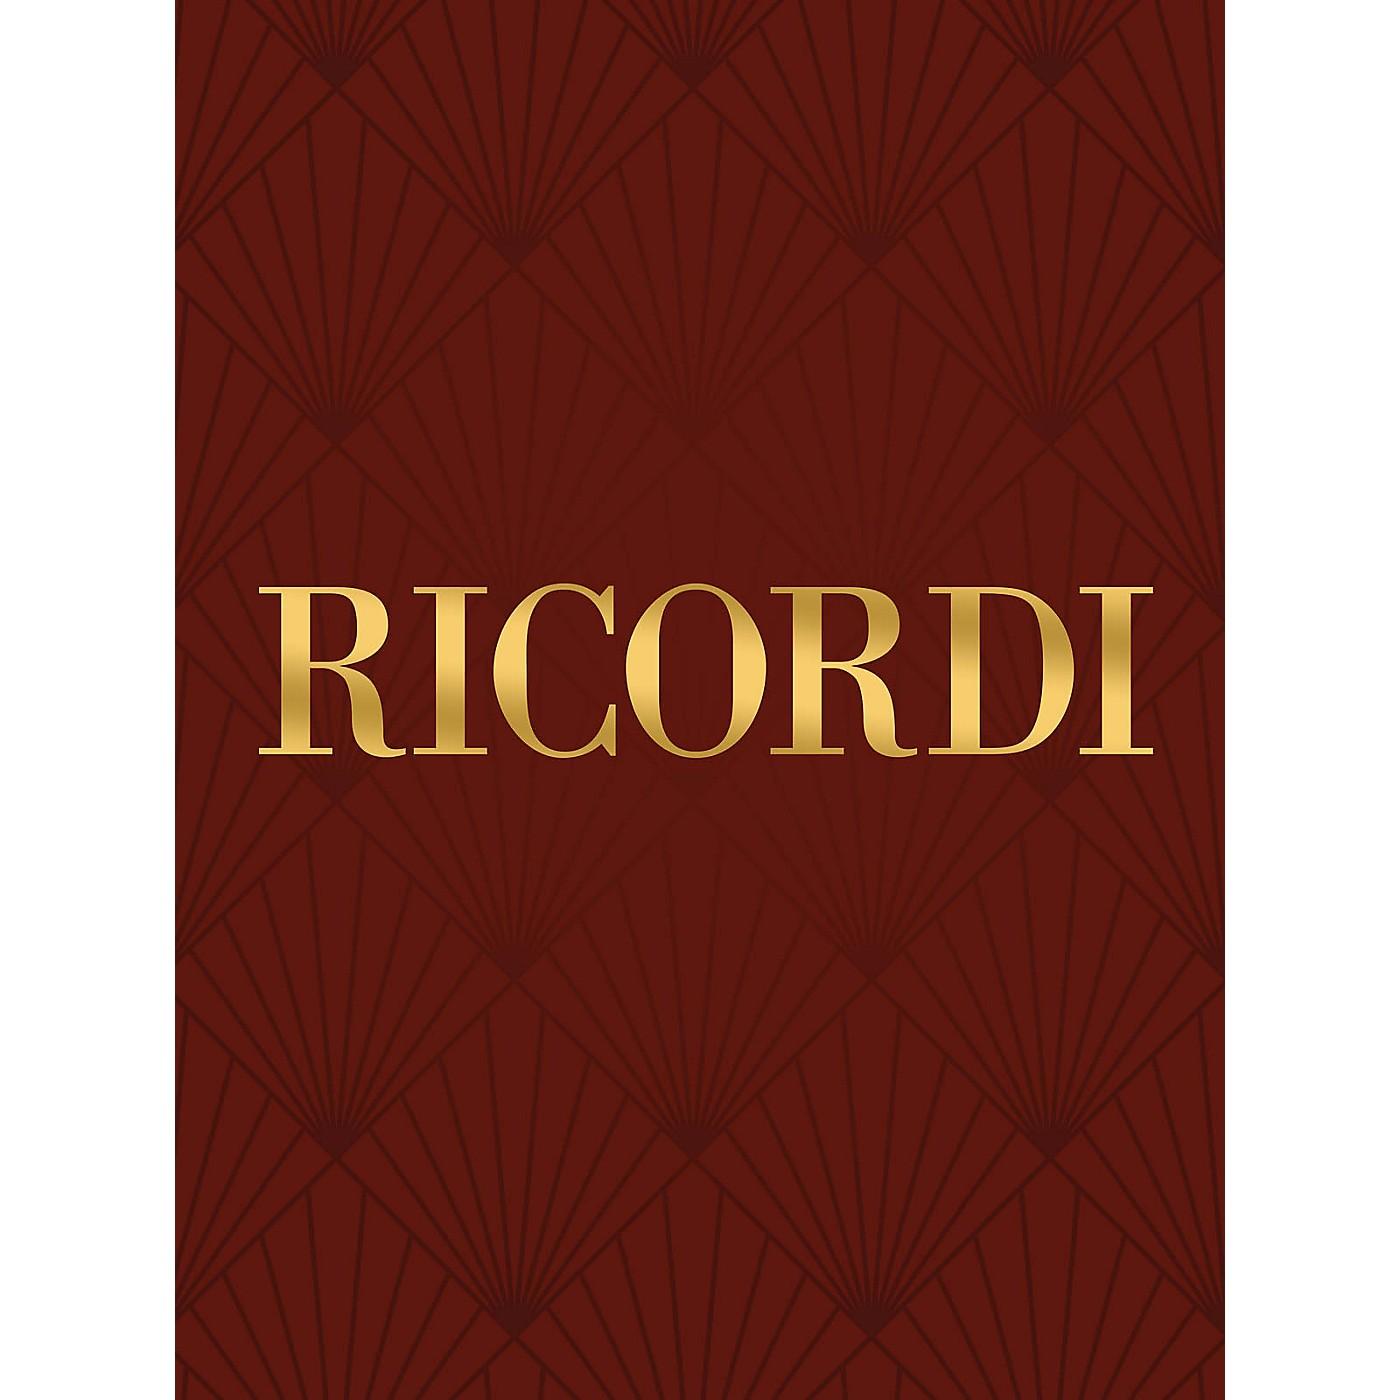 Ricordi 43 Ghiribizzi (Guitar Collection) Guitar Collection Series Composed by Niccolò Paganini thumbnail